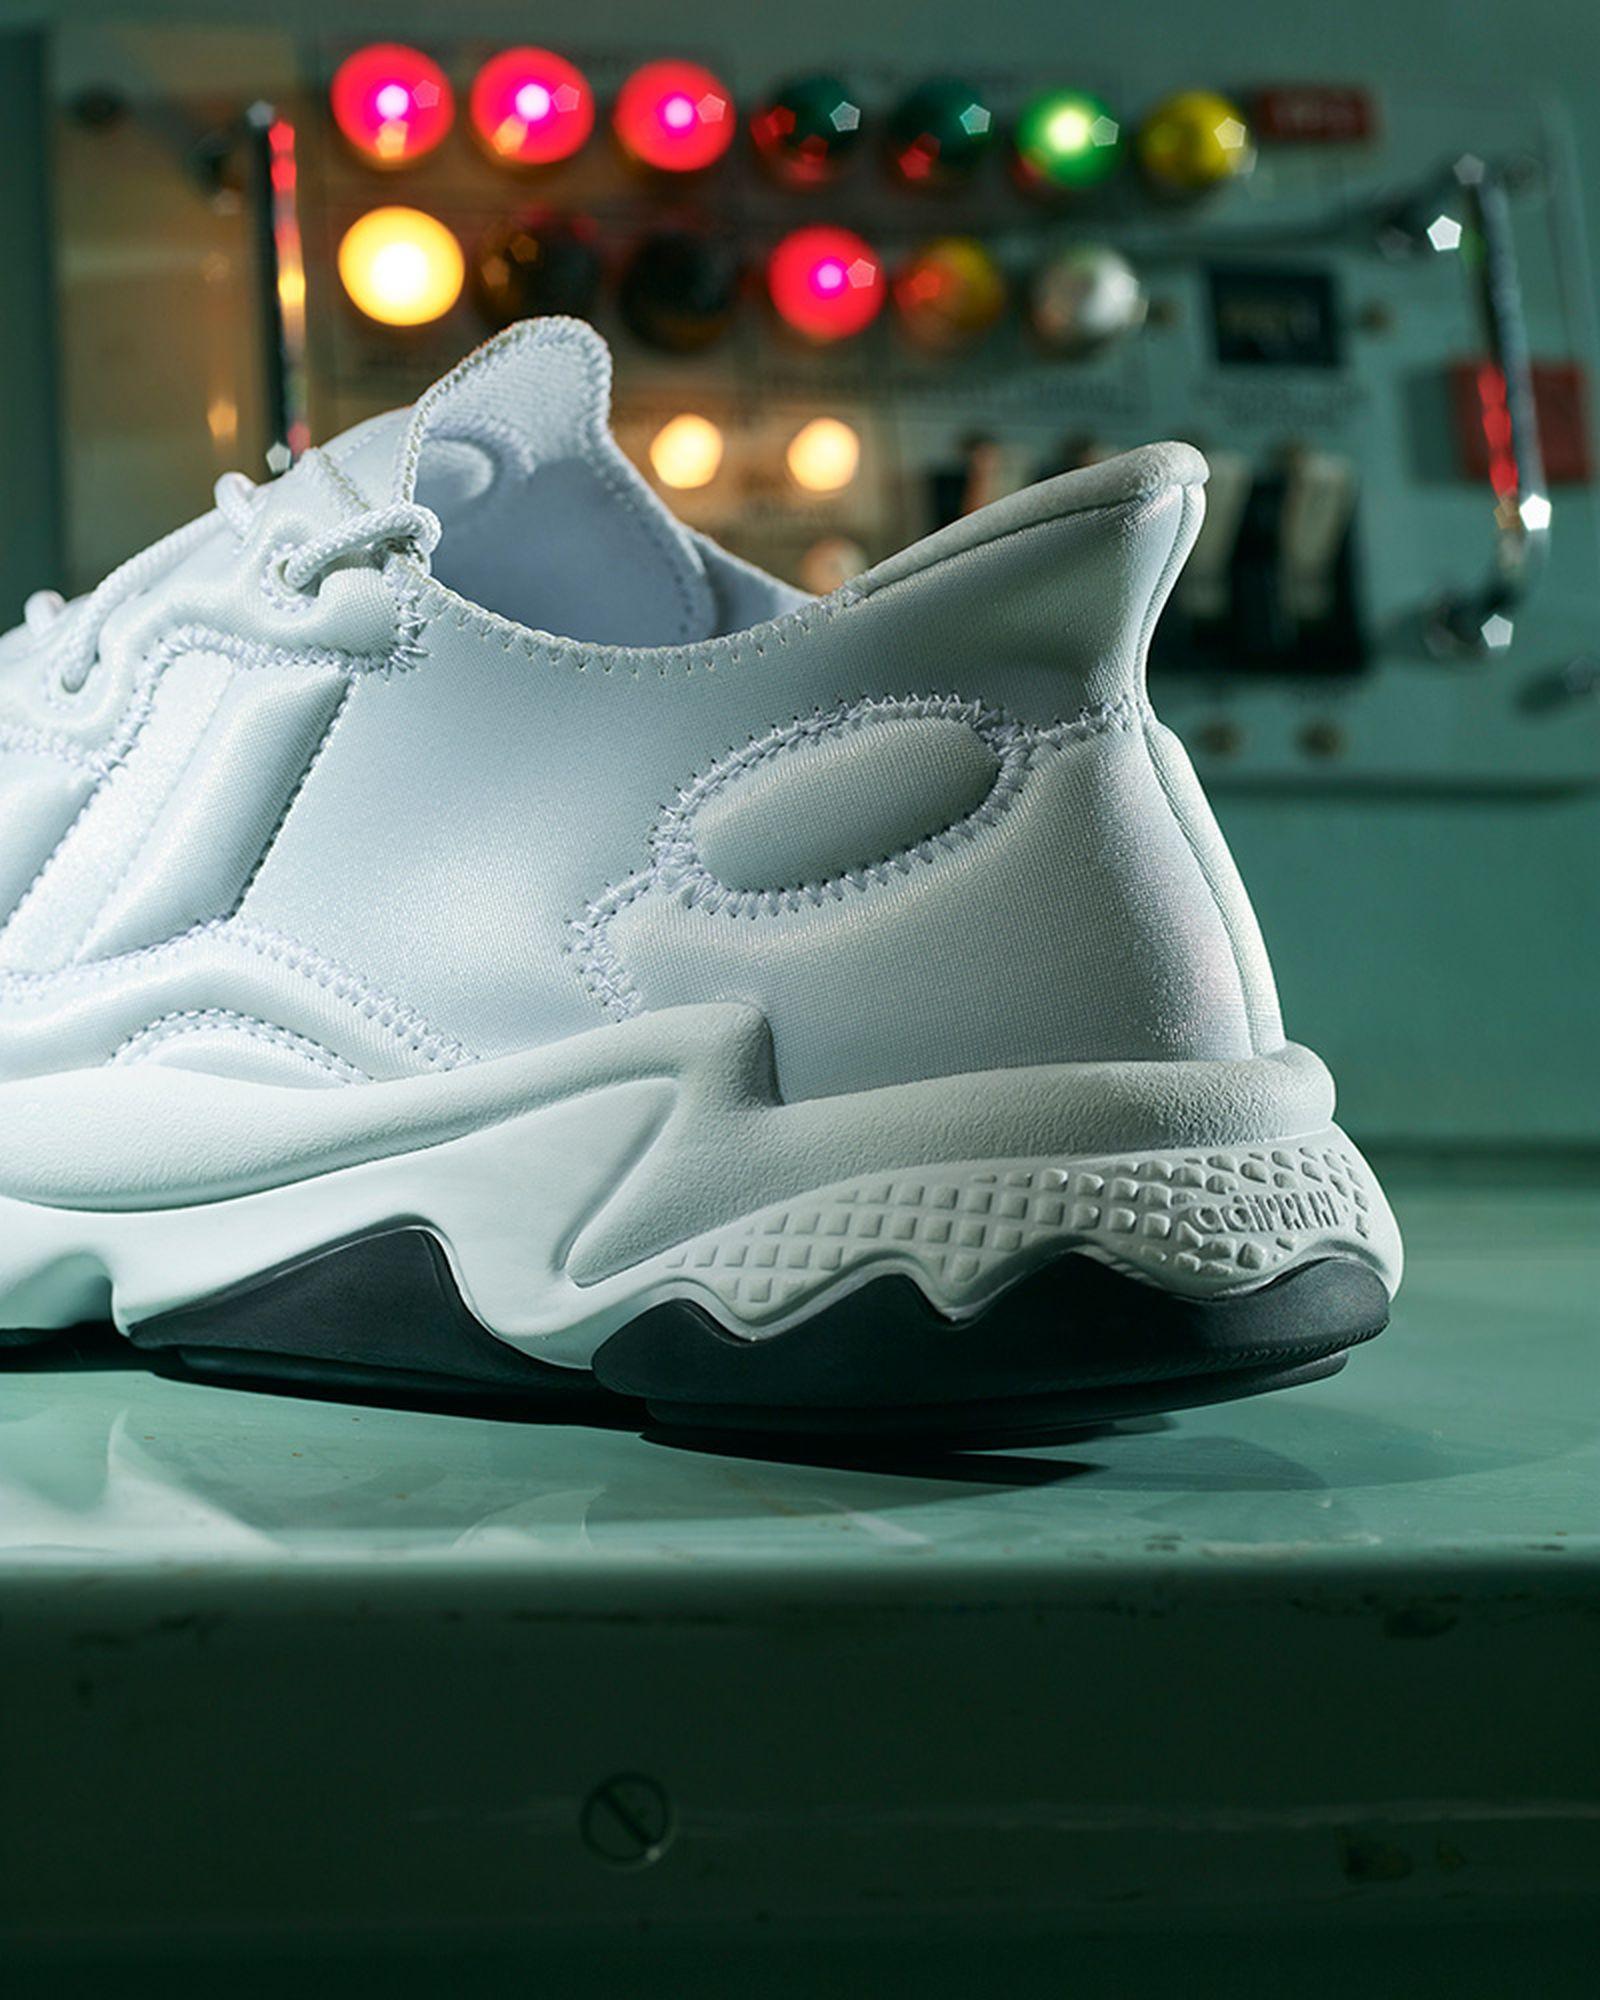 adidas-originals-ozweego-tech-moon-landing-release-date-price-02